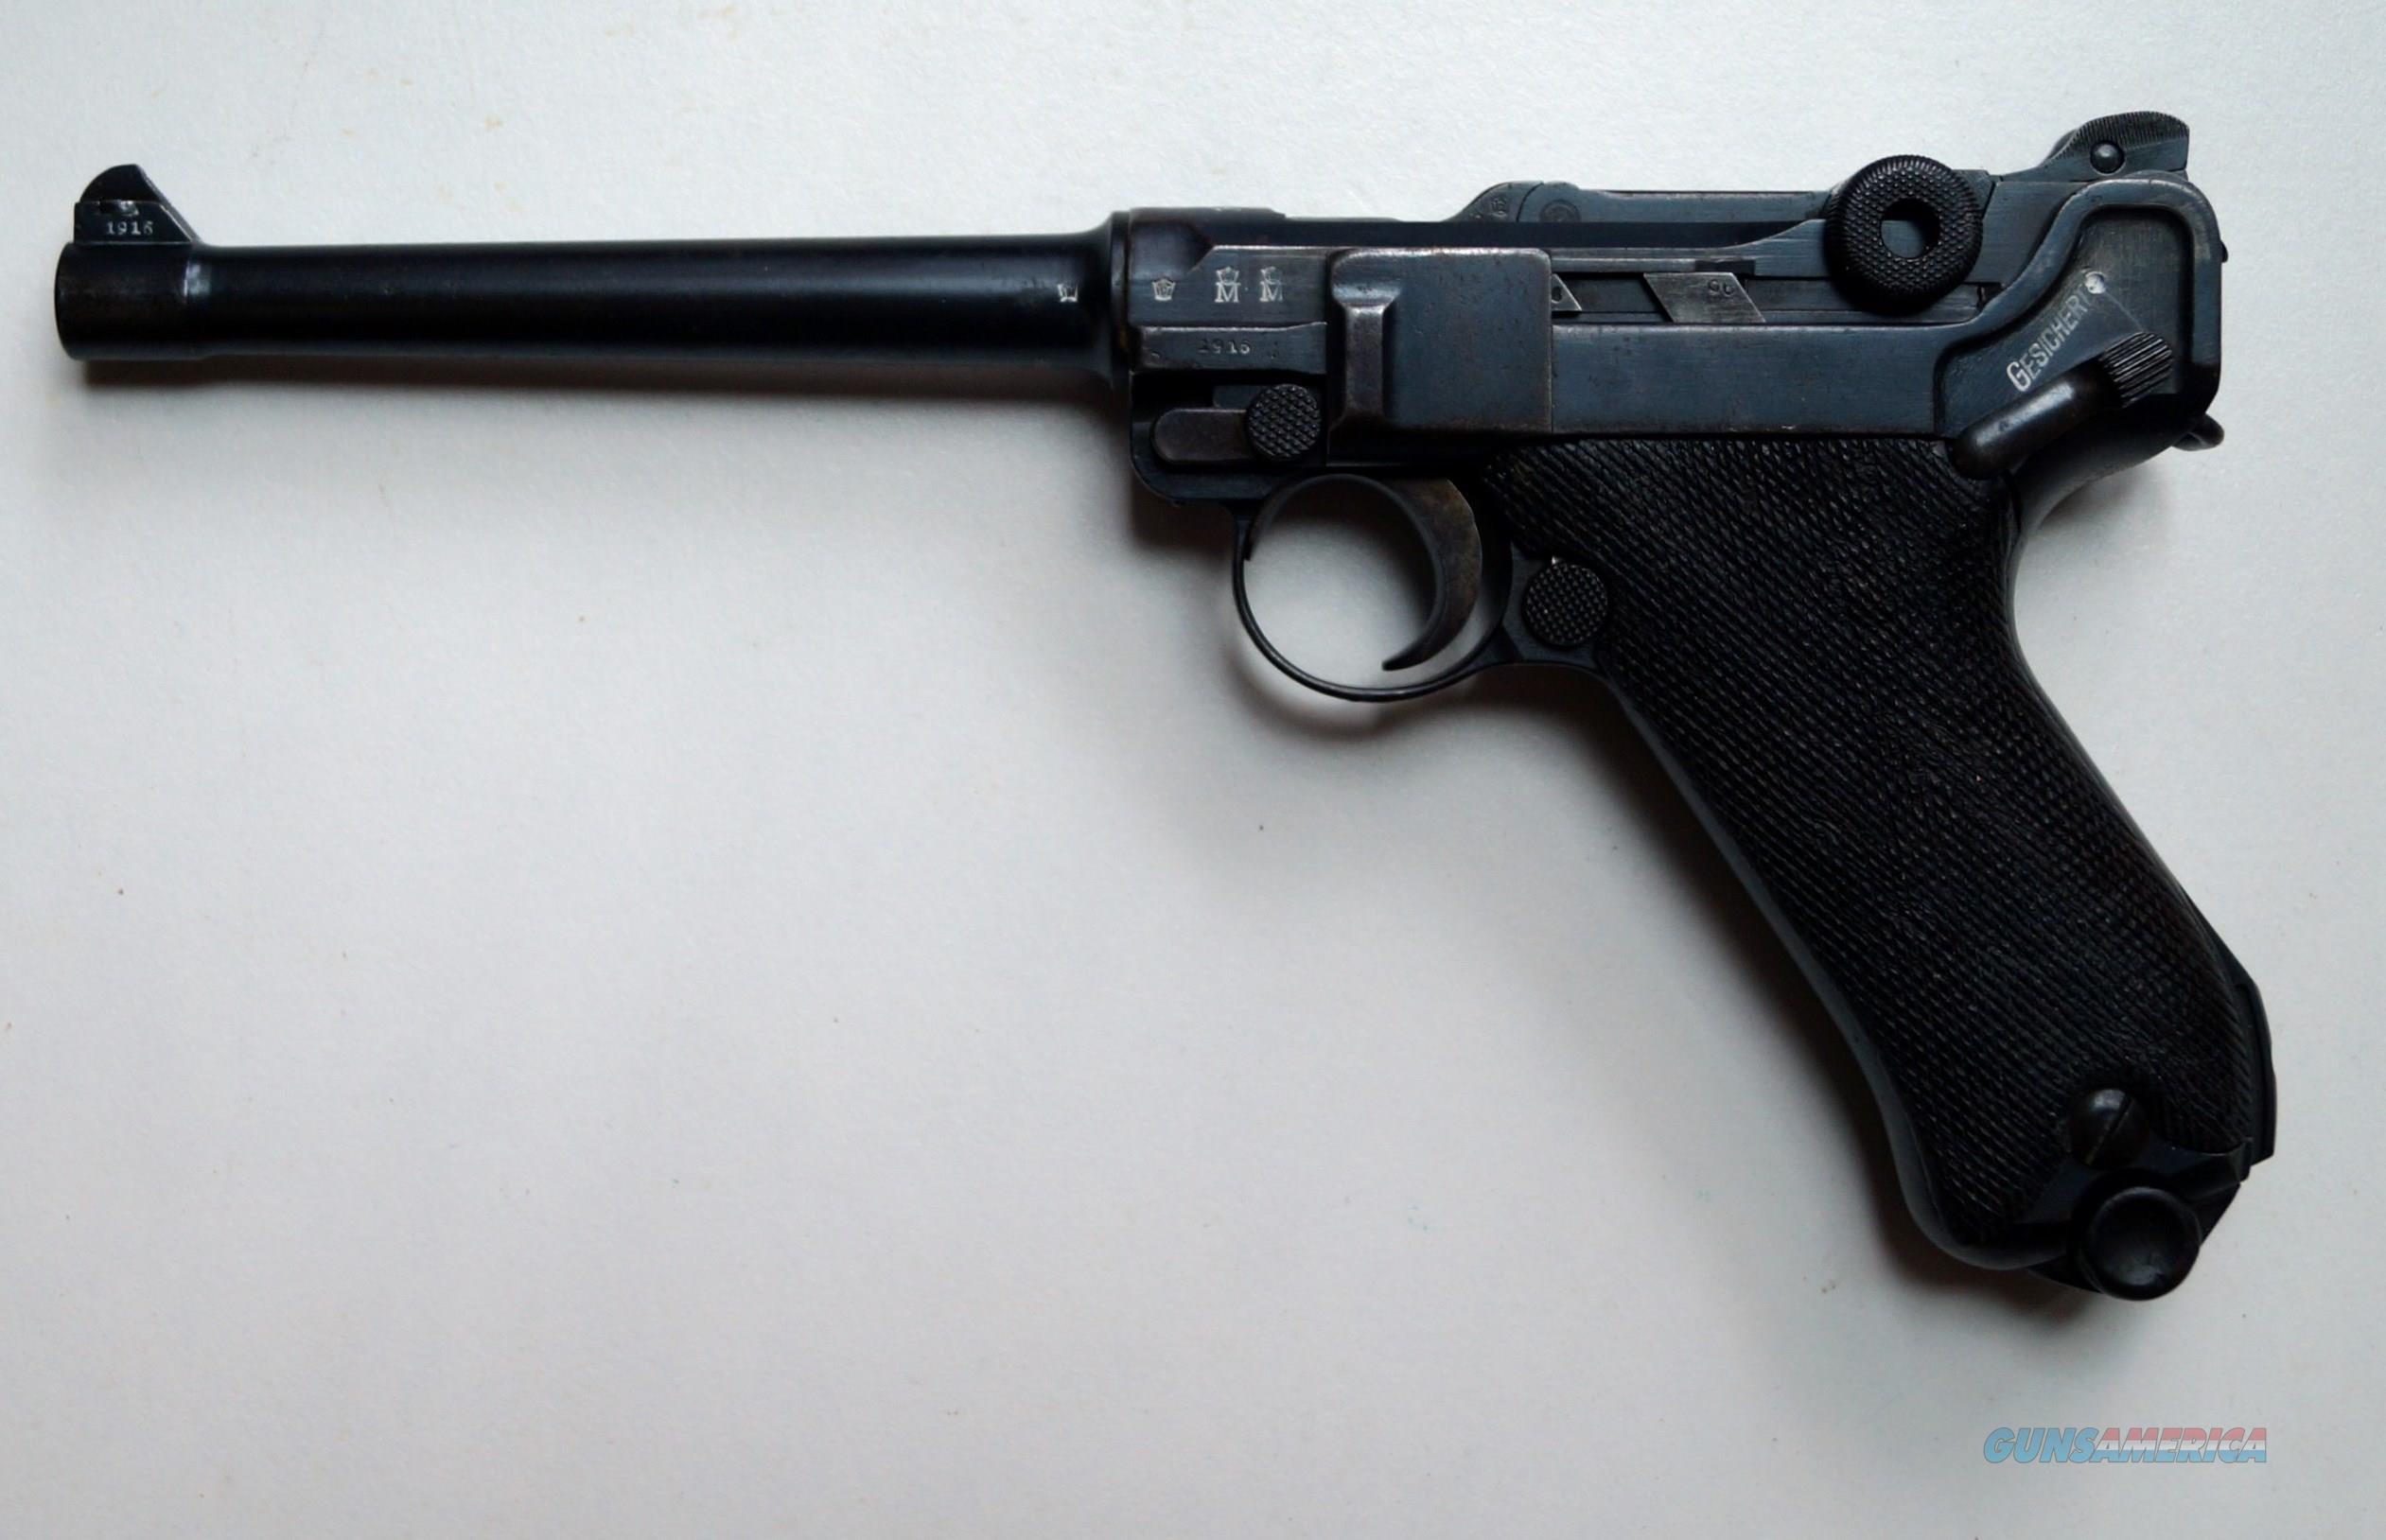 1916 DWM NAVY GERMAN LUGER   Guns > Pistols > Luger Pistols